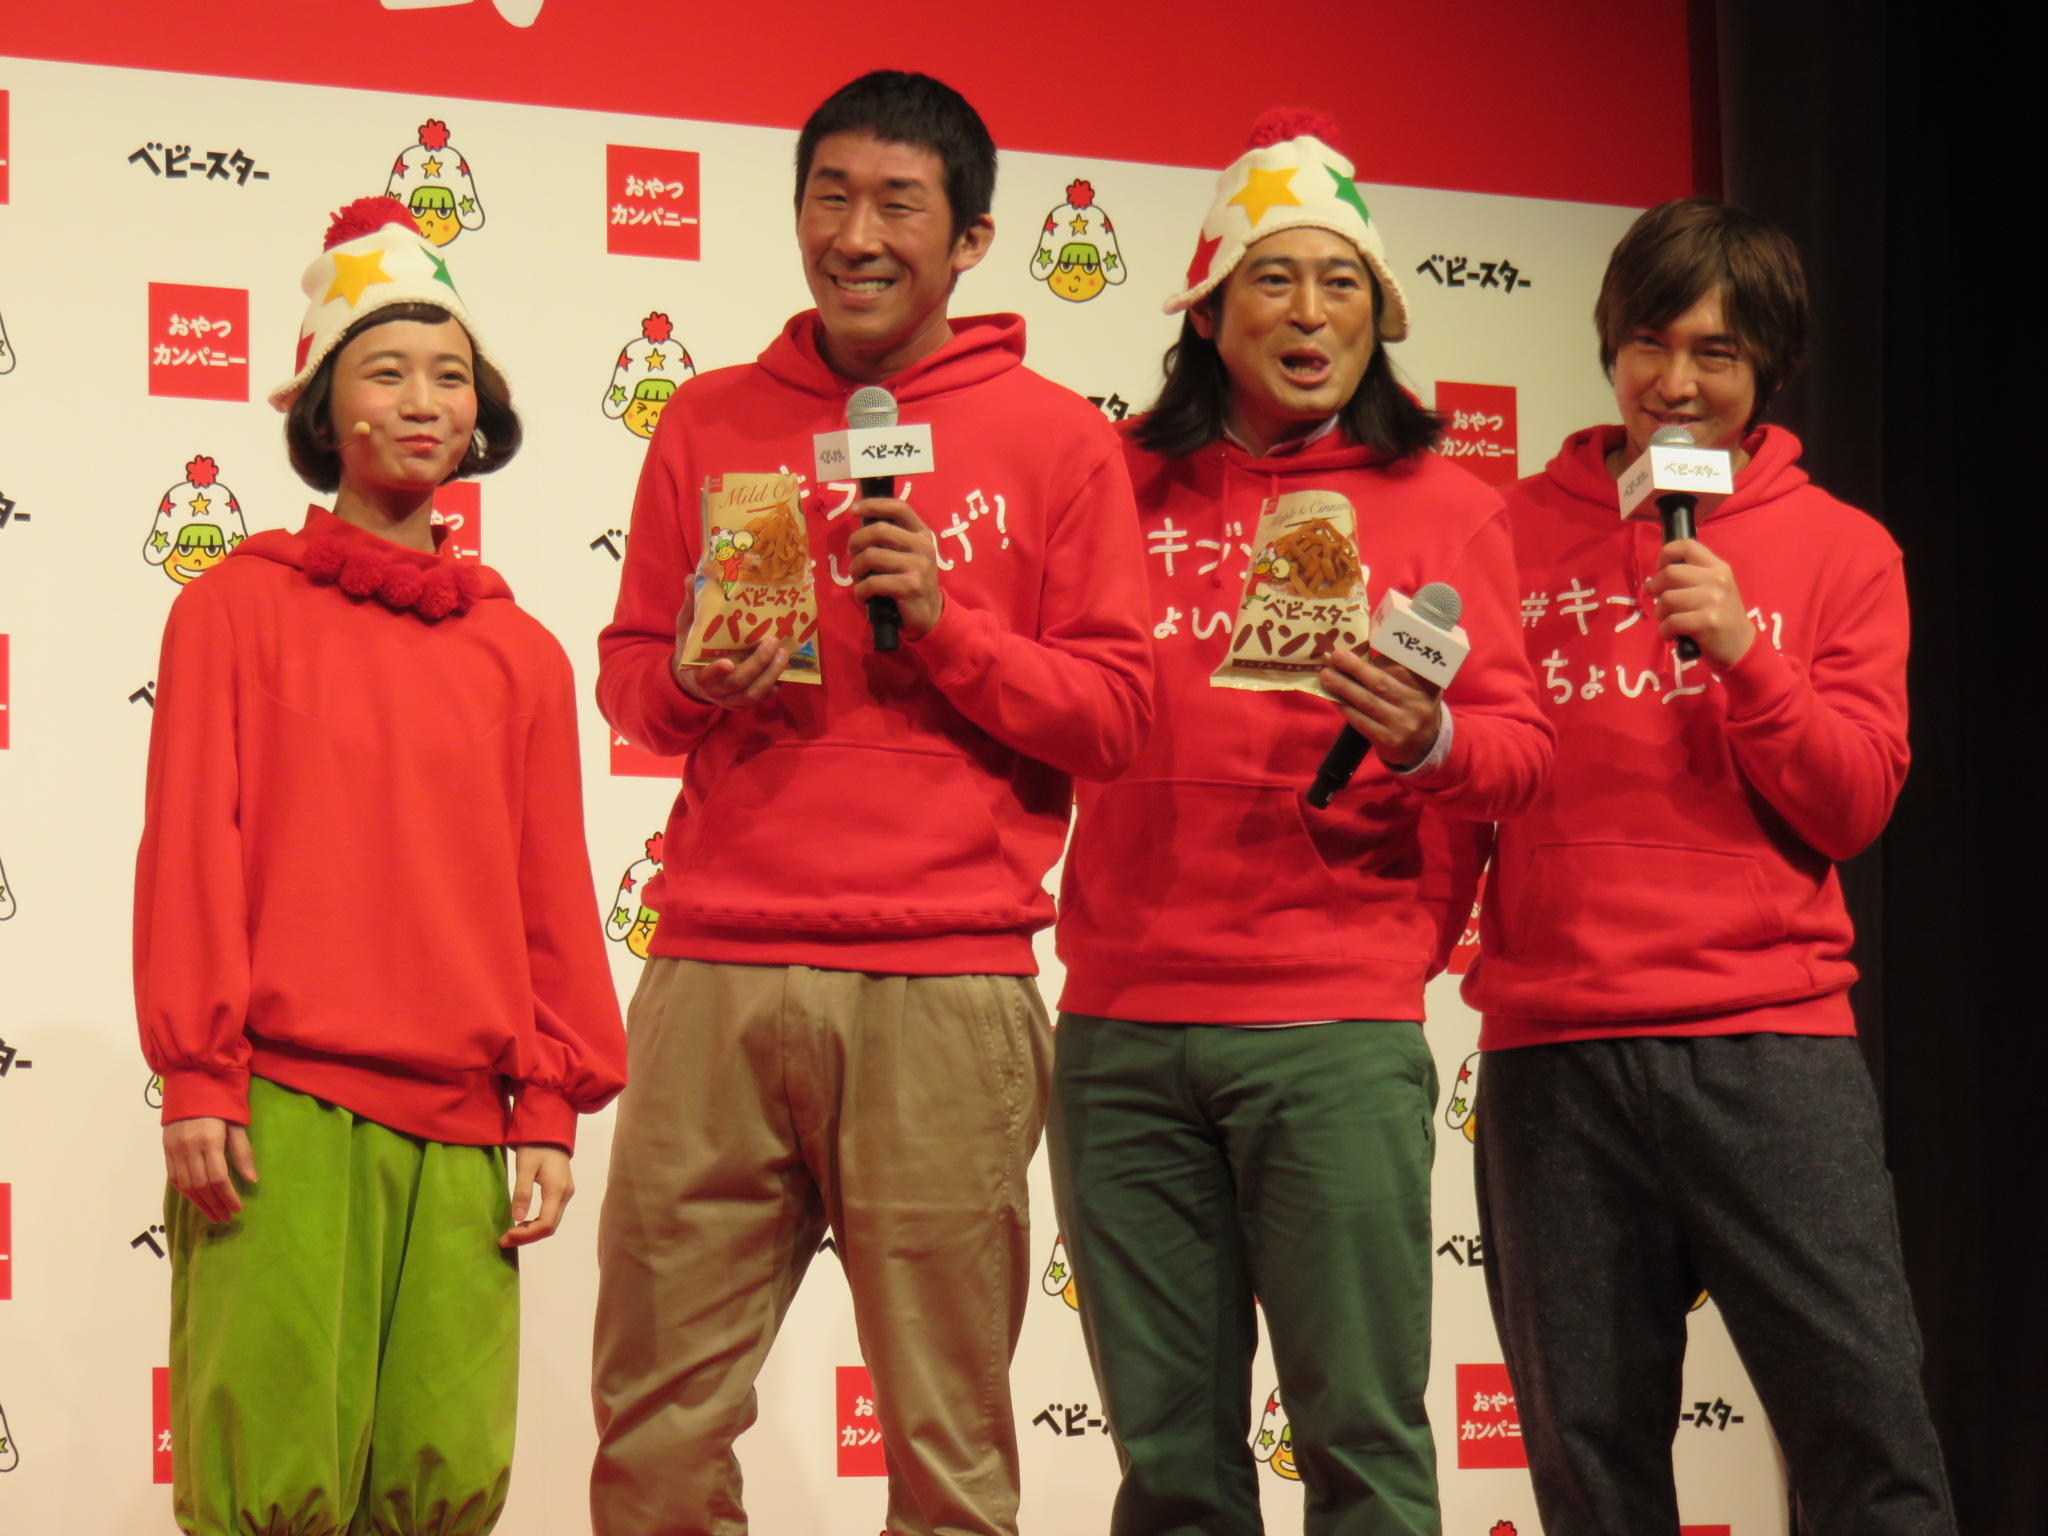 http://news.yoshimoto.co.jp/20170131190426-294f0aabea30f45f8948fc8ff2d8d9c48e2fa80d.jpg